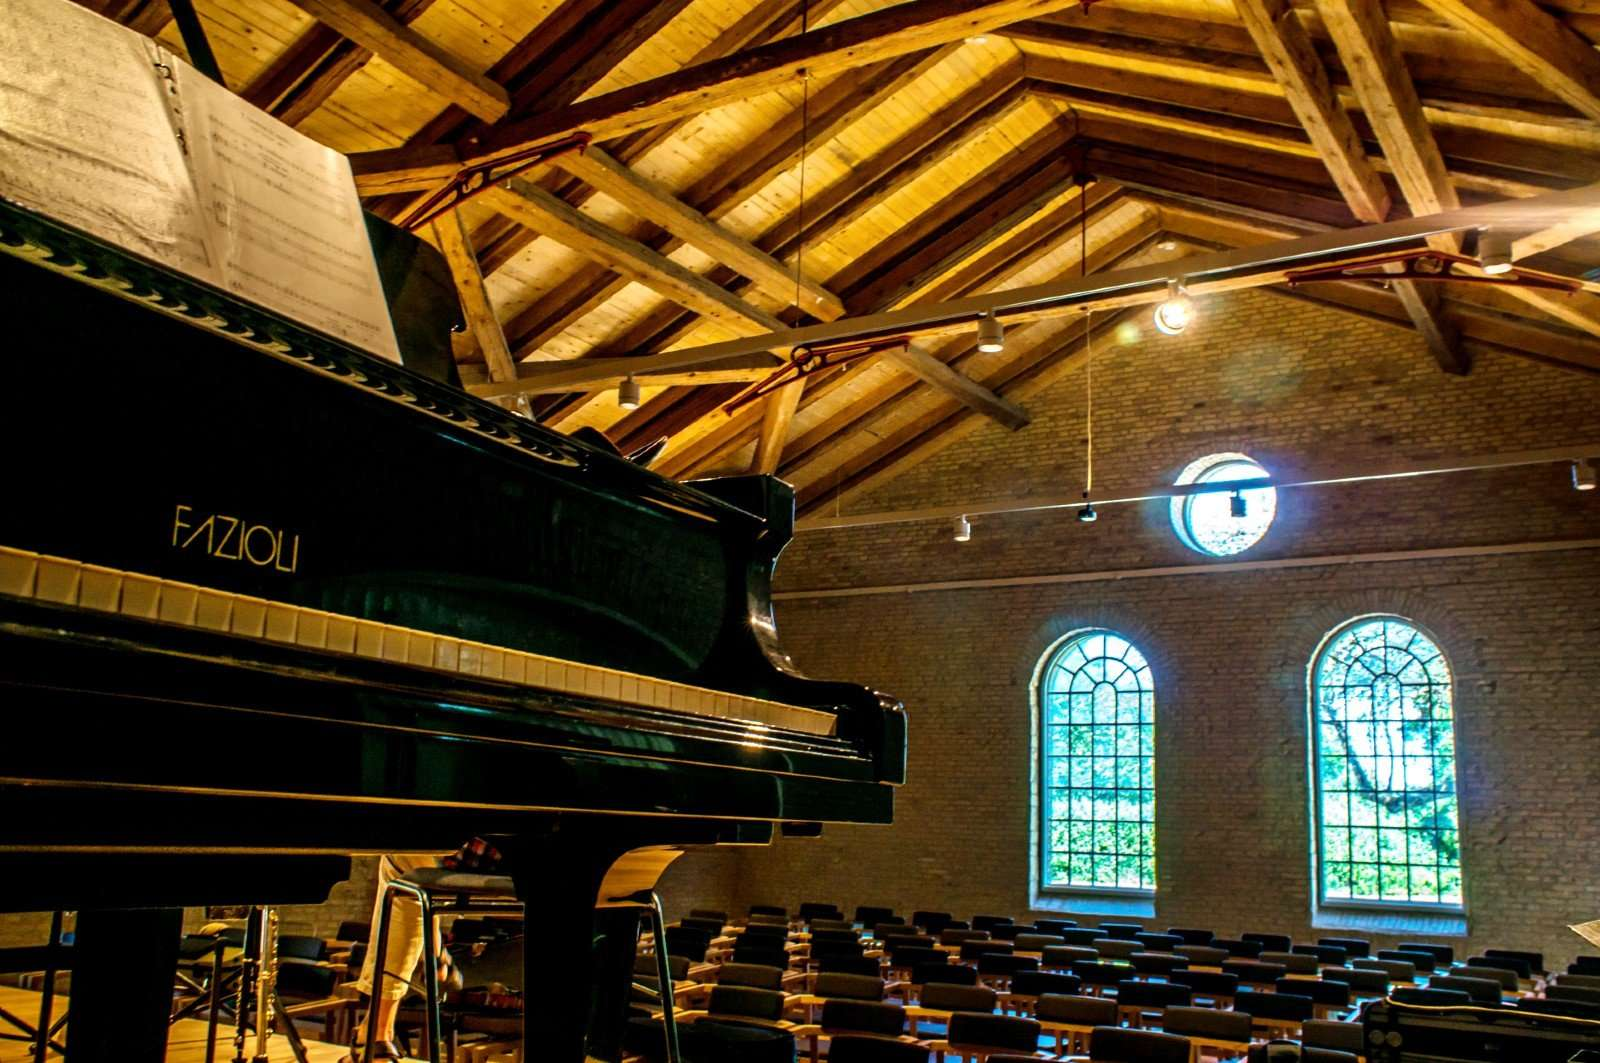 Koncertsalen i KUMUS, foto: Stéphane Tran Ngoc